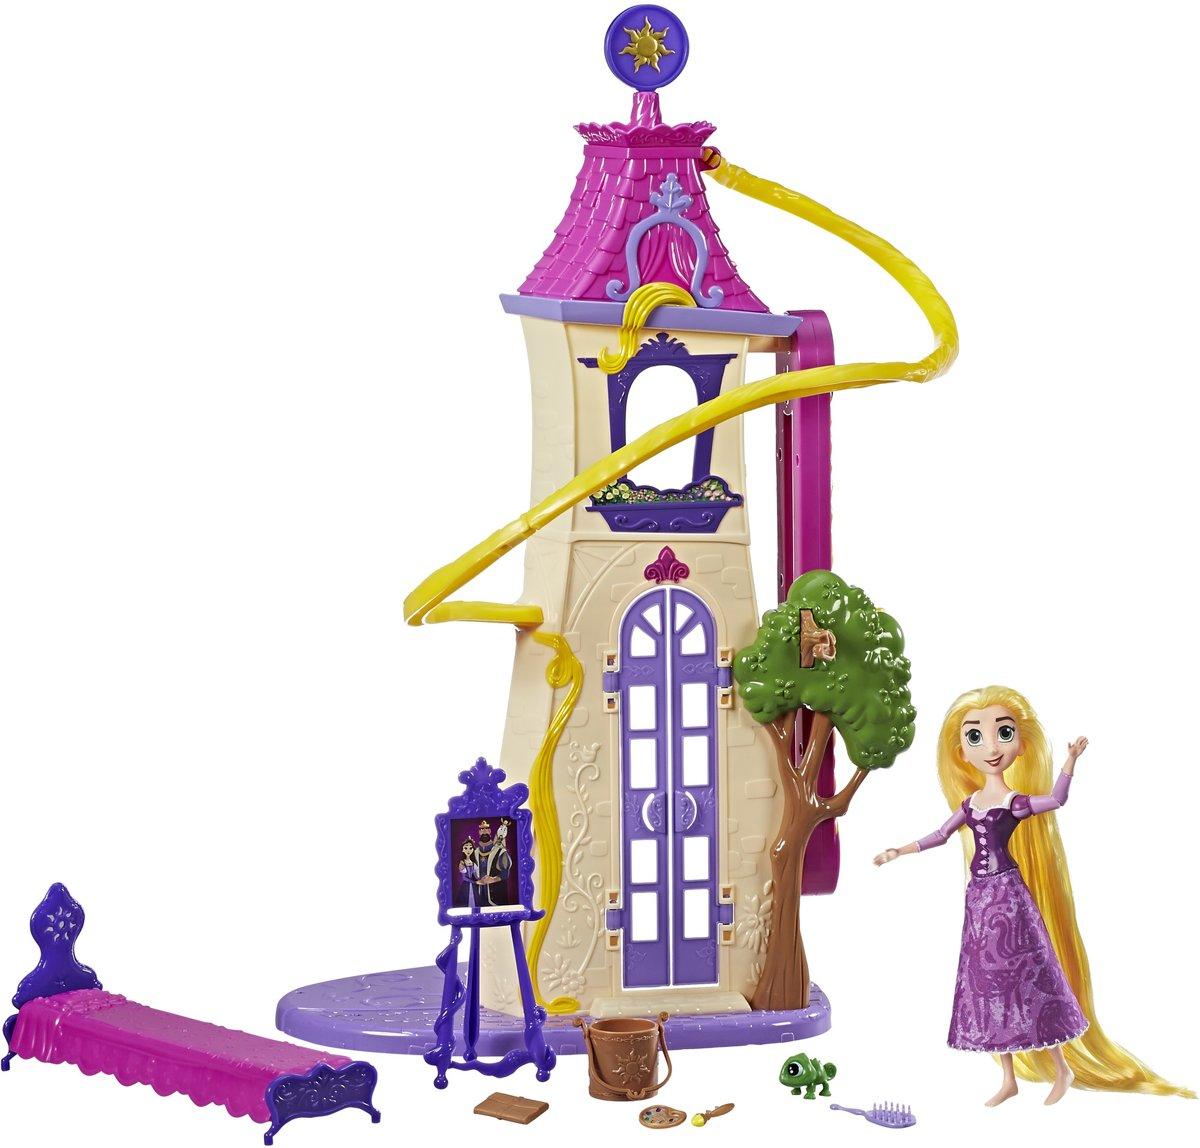 Disney Princess Tangled Rapunzel's Zwaaiende Lokken Kasteel